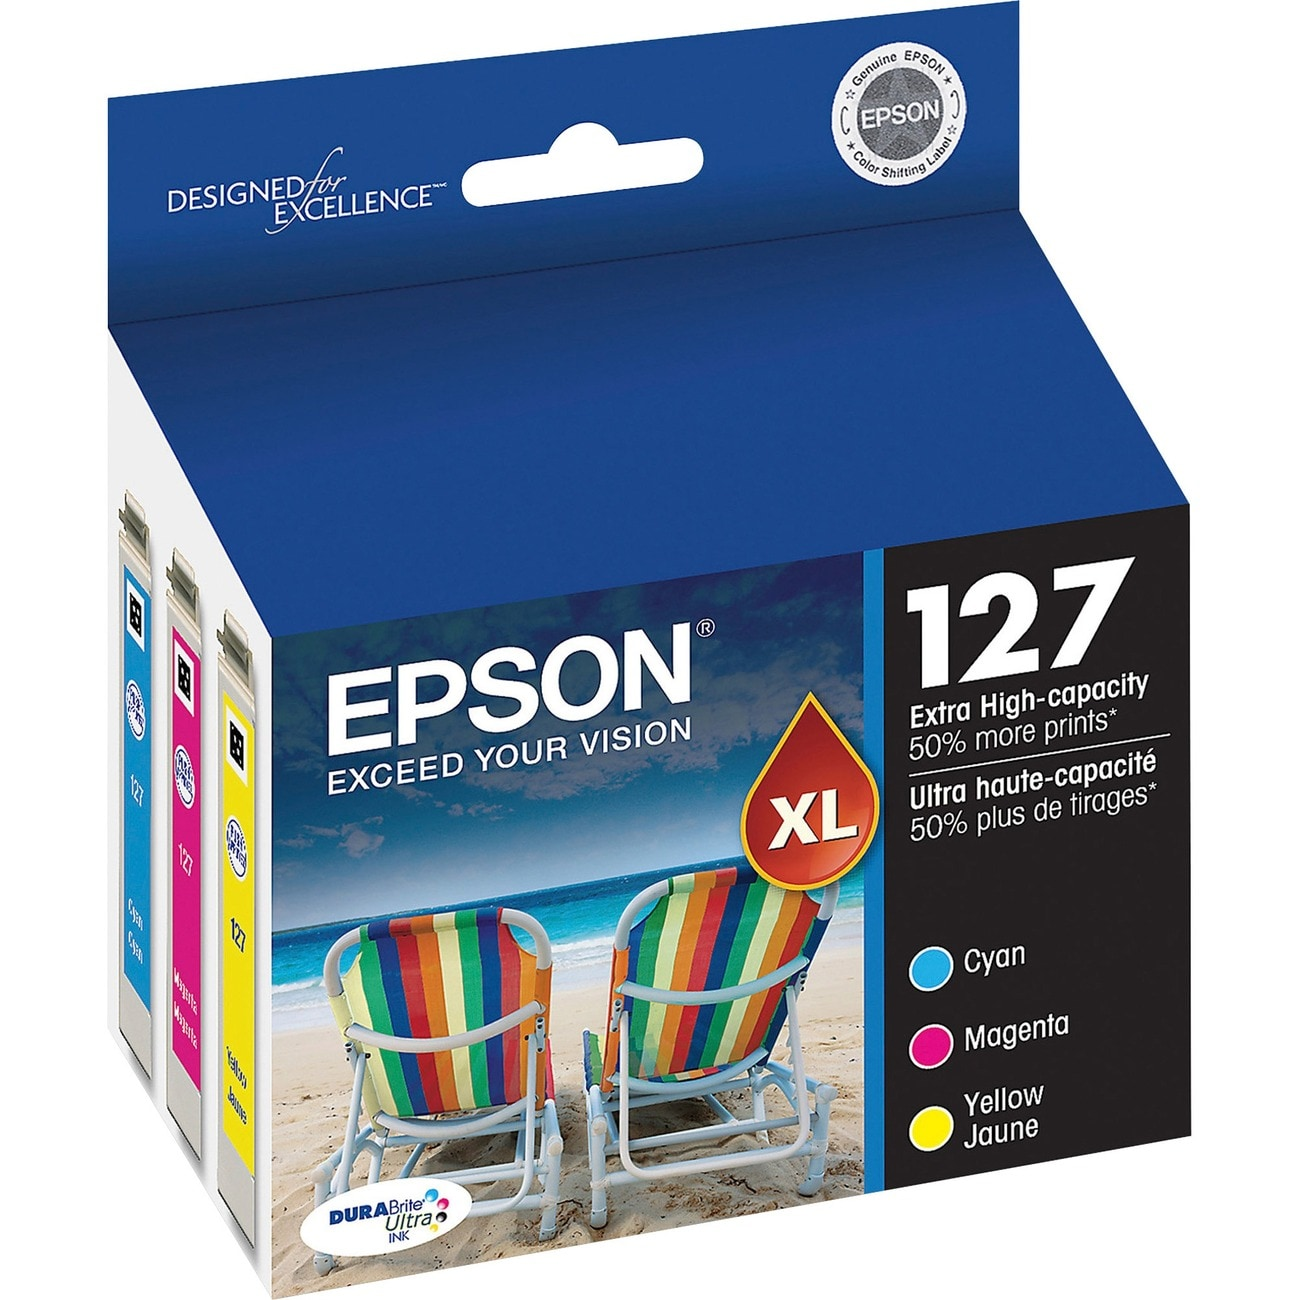 Epson DURABrite T127520 High Capacity Multi-Pack Ink Cartridge